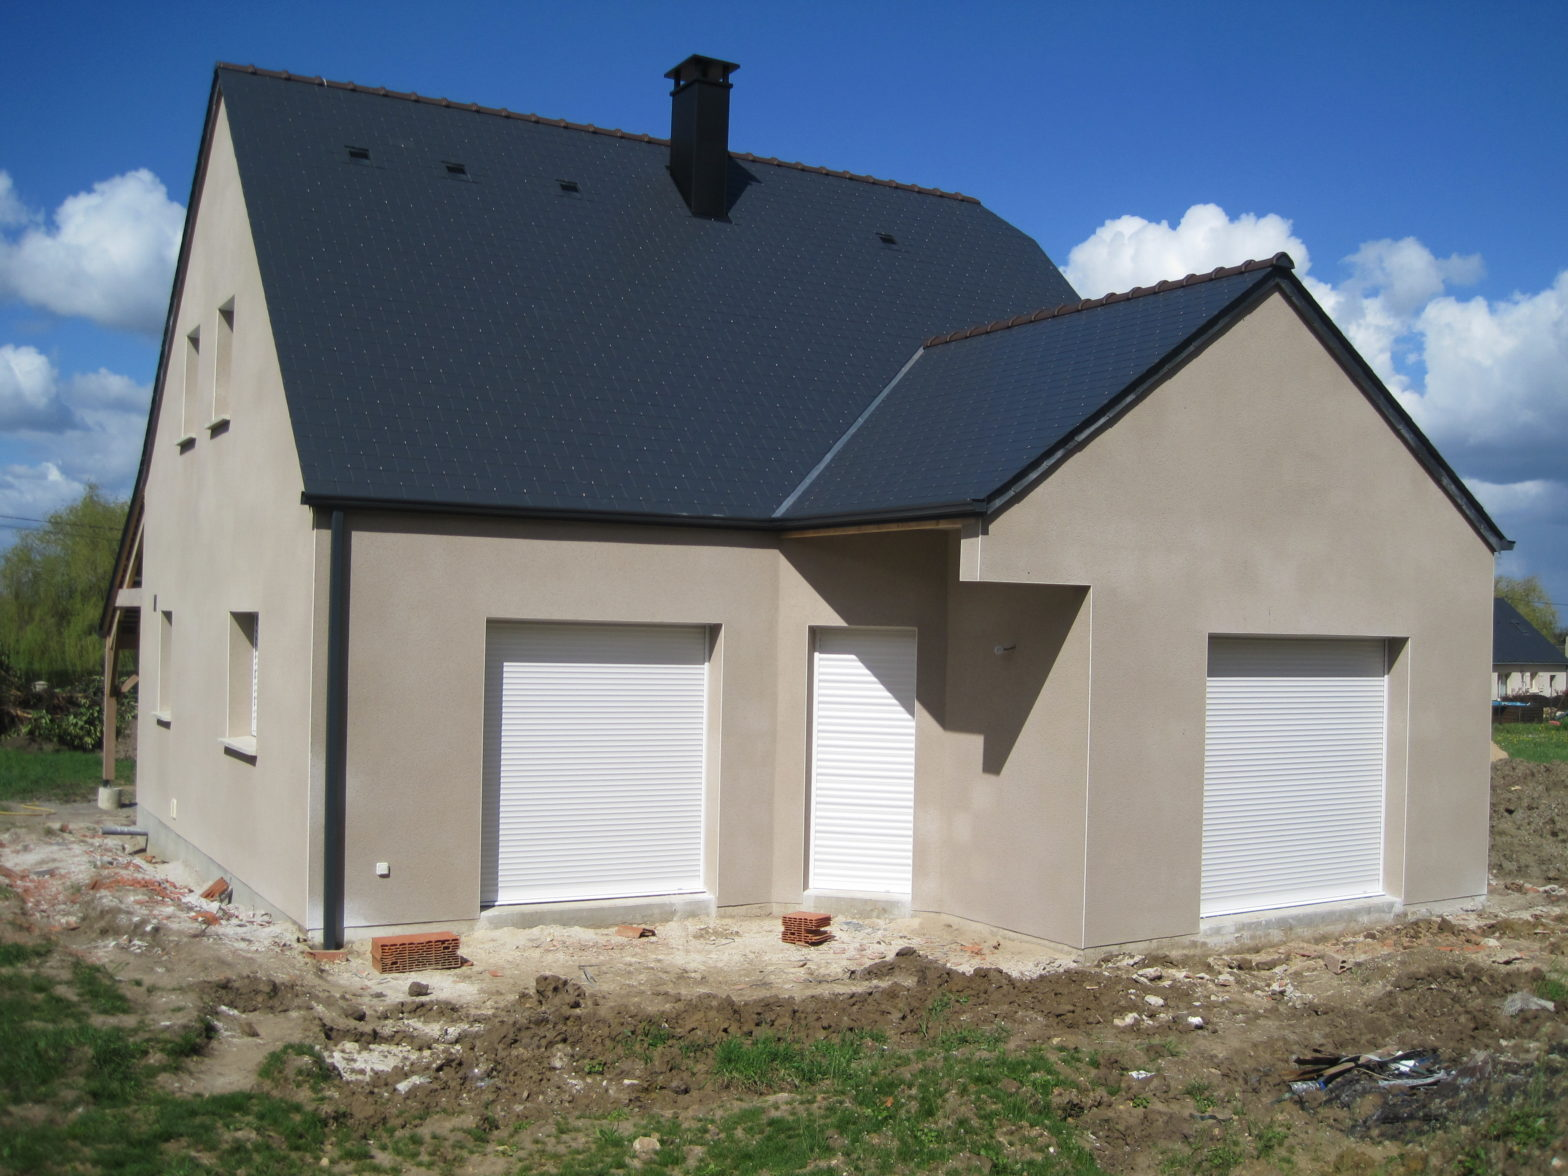 maison etage comble toiture ardoise sarrigne